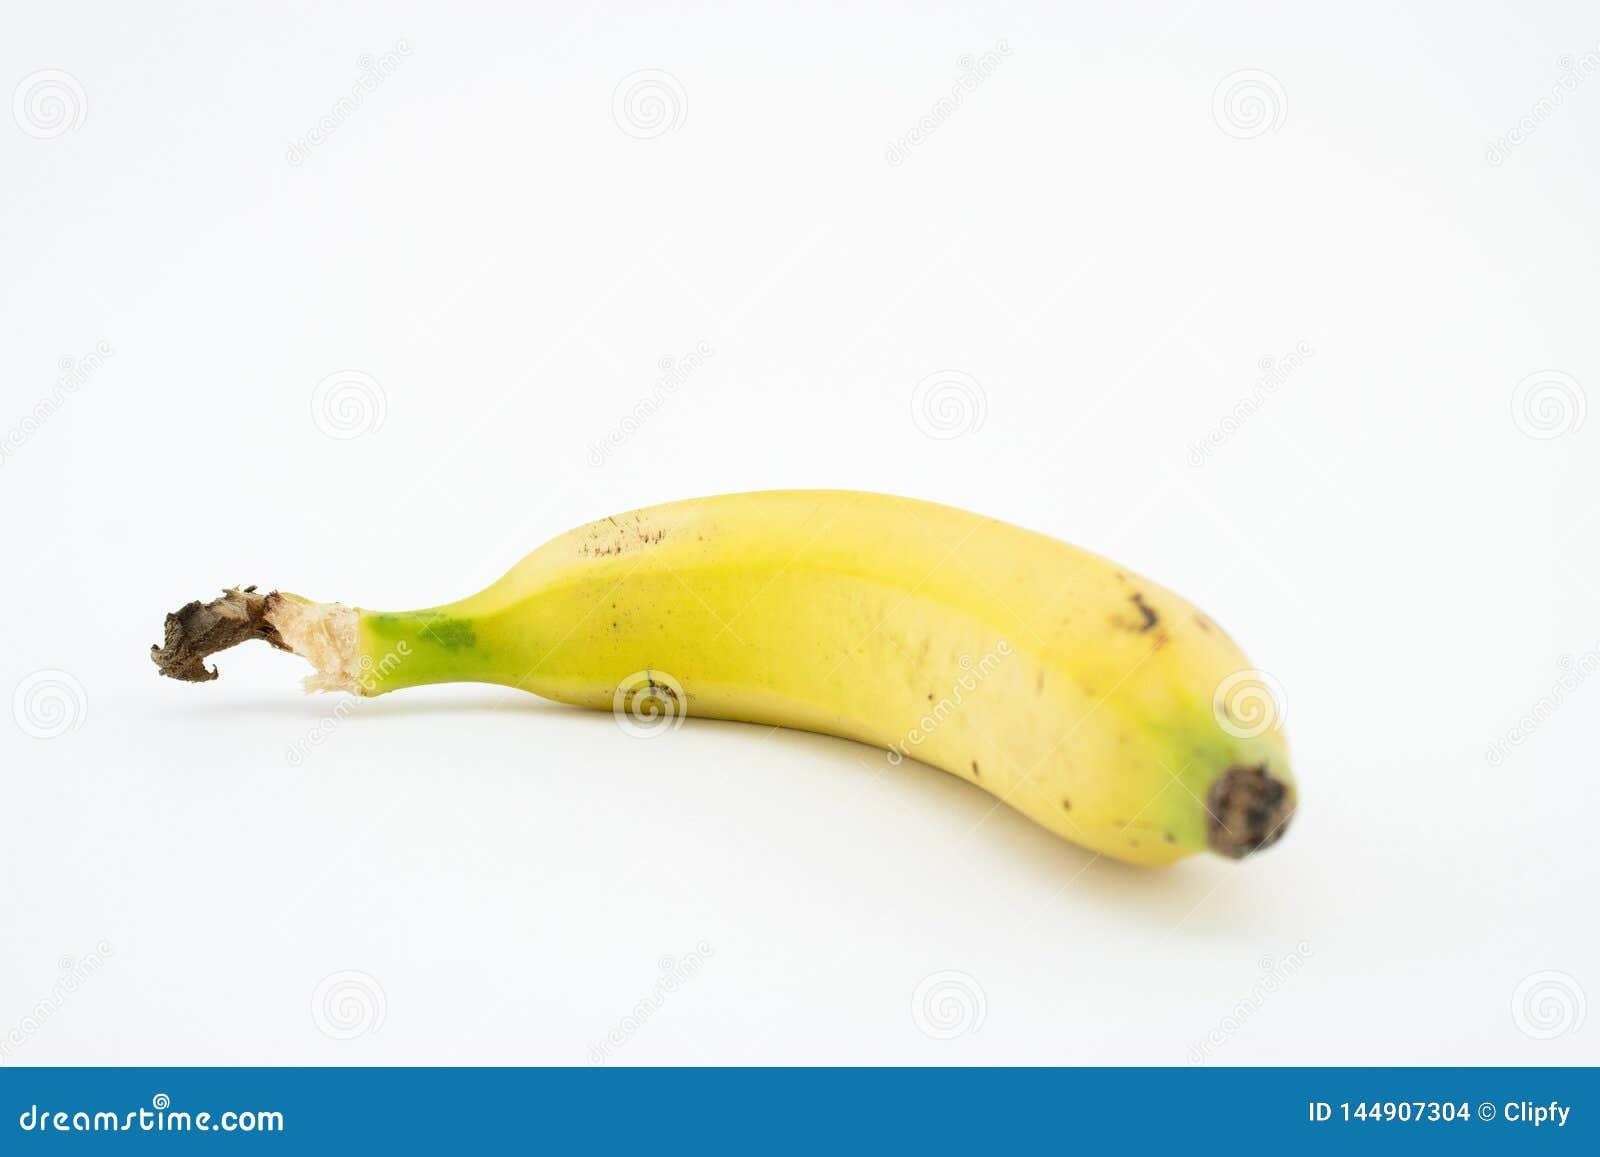 Banana or plantain isolated on white background. Potassium and magnesium